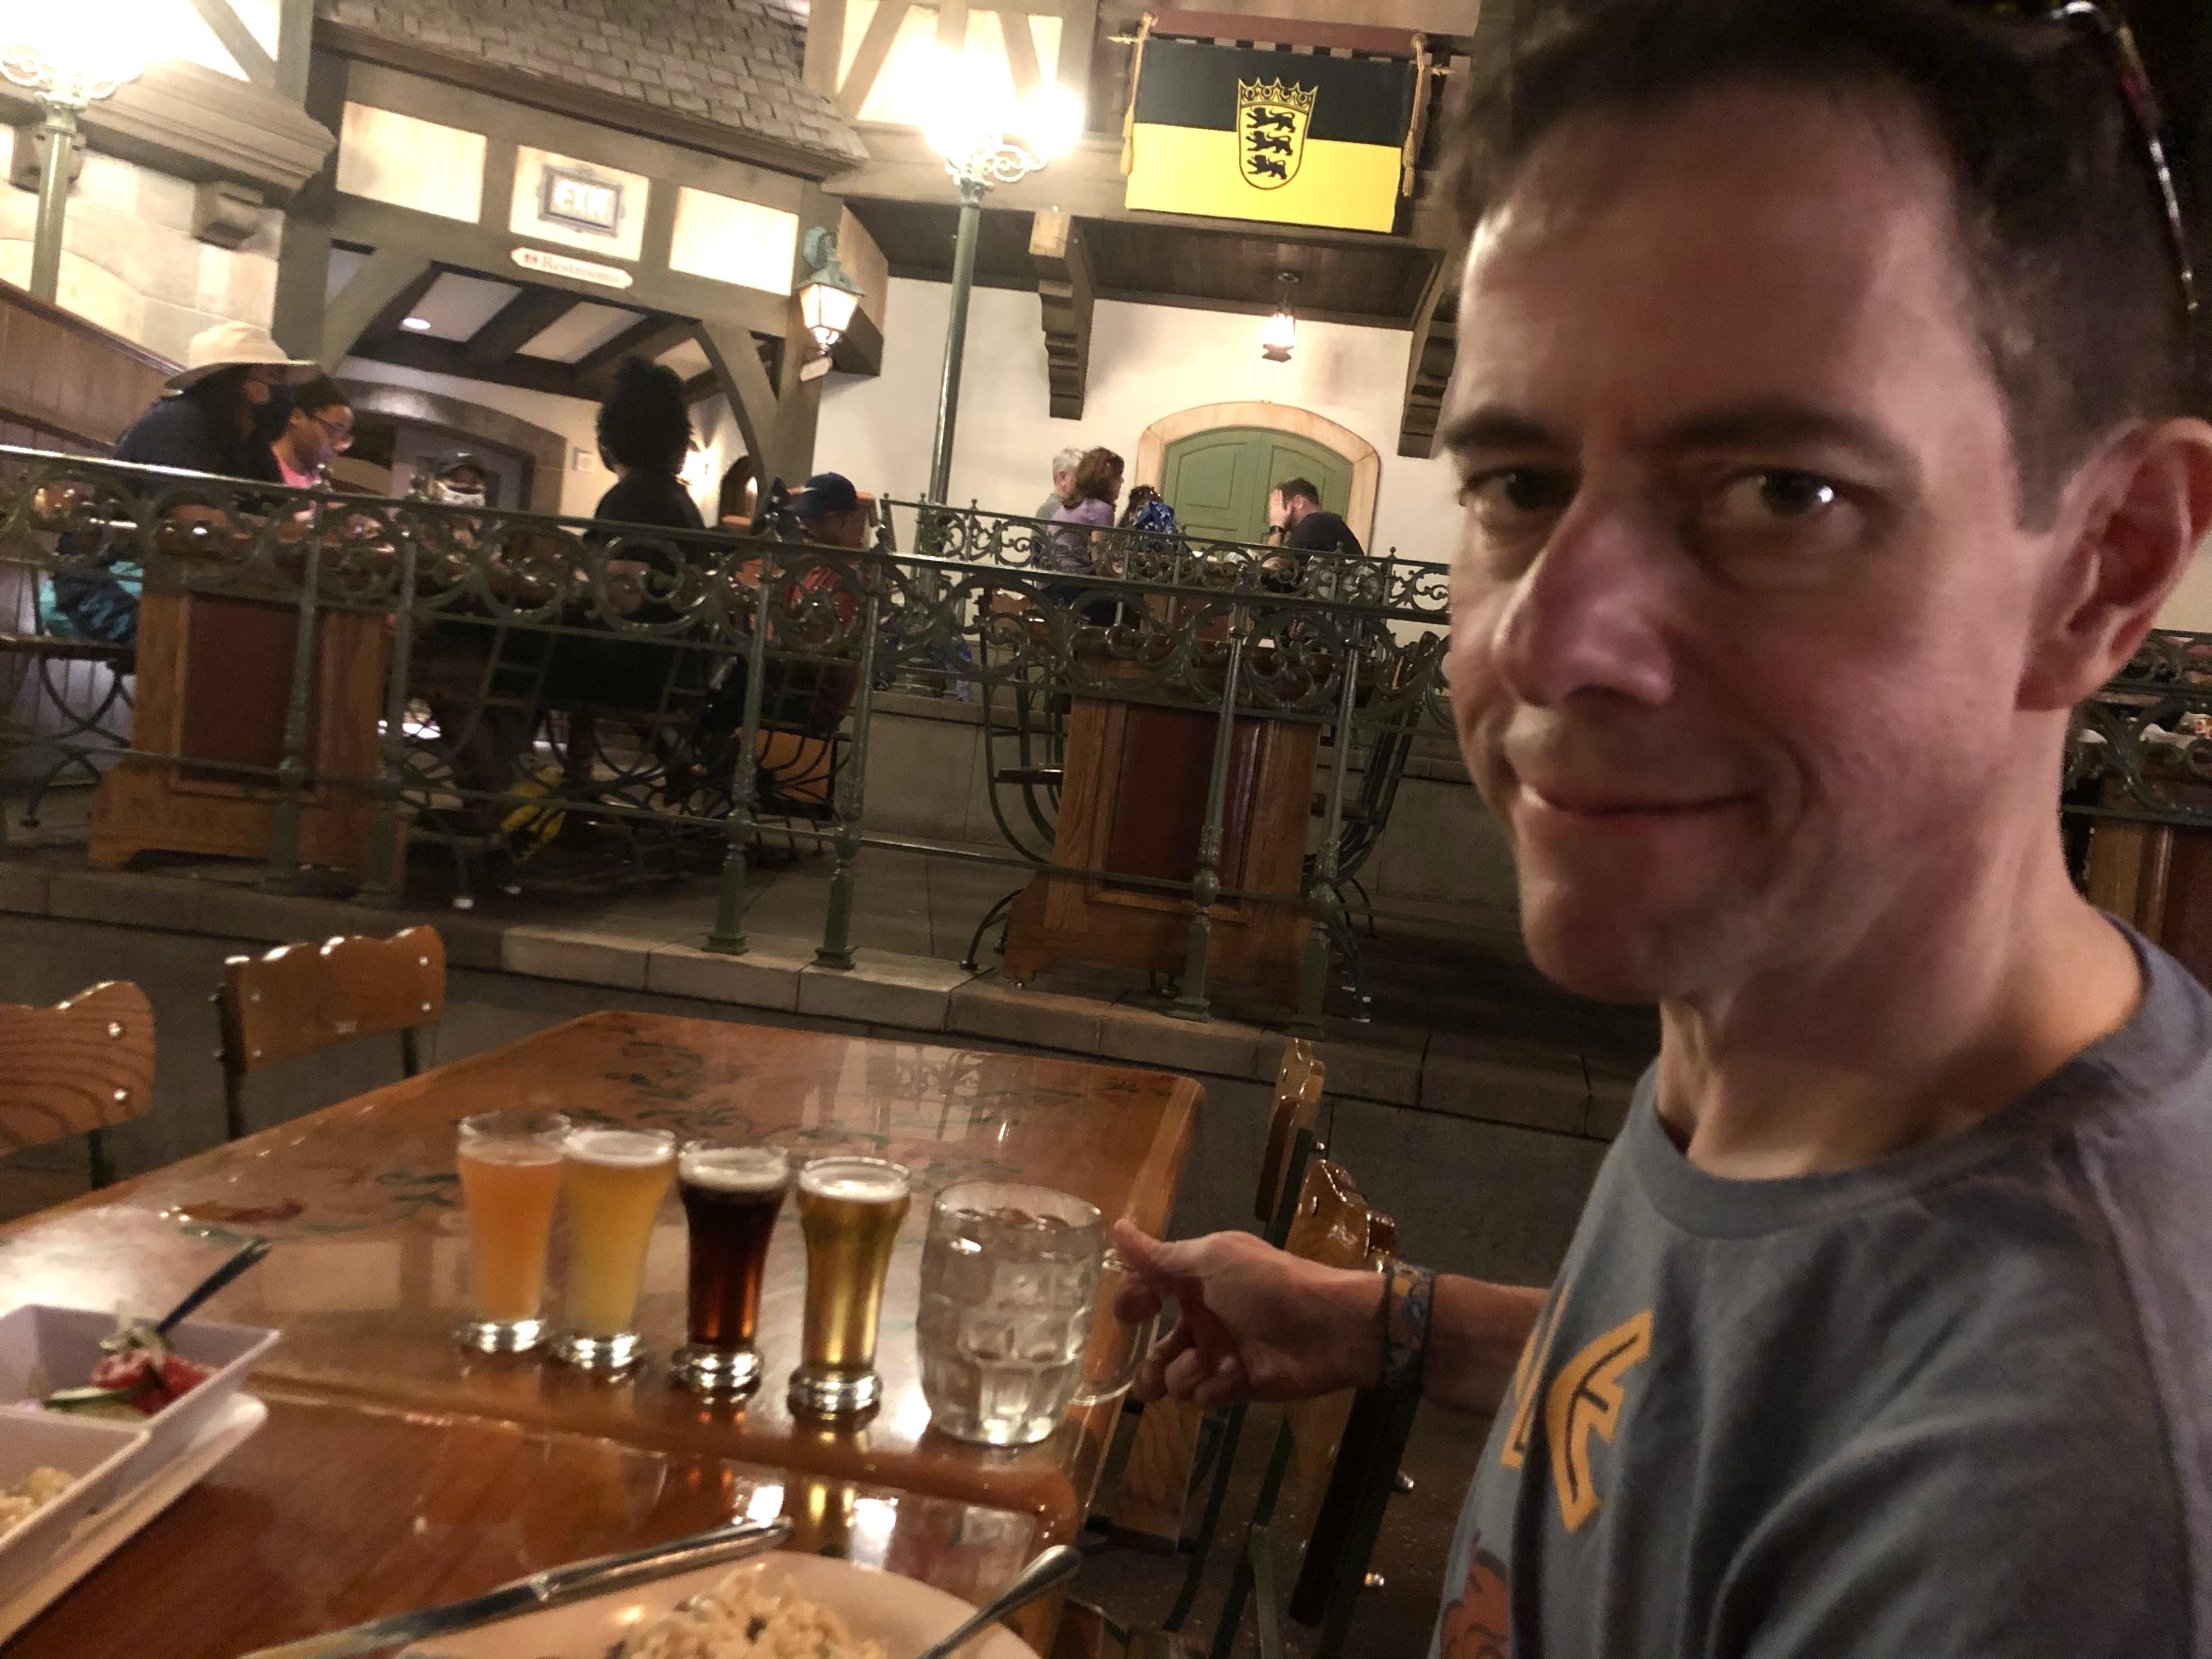 Beer fl